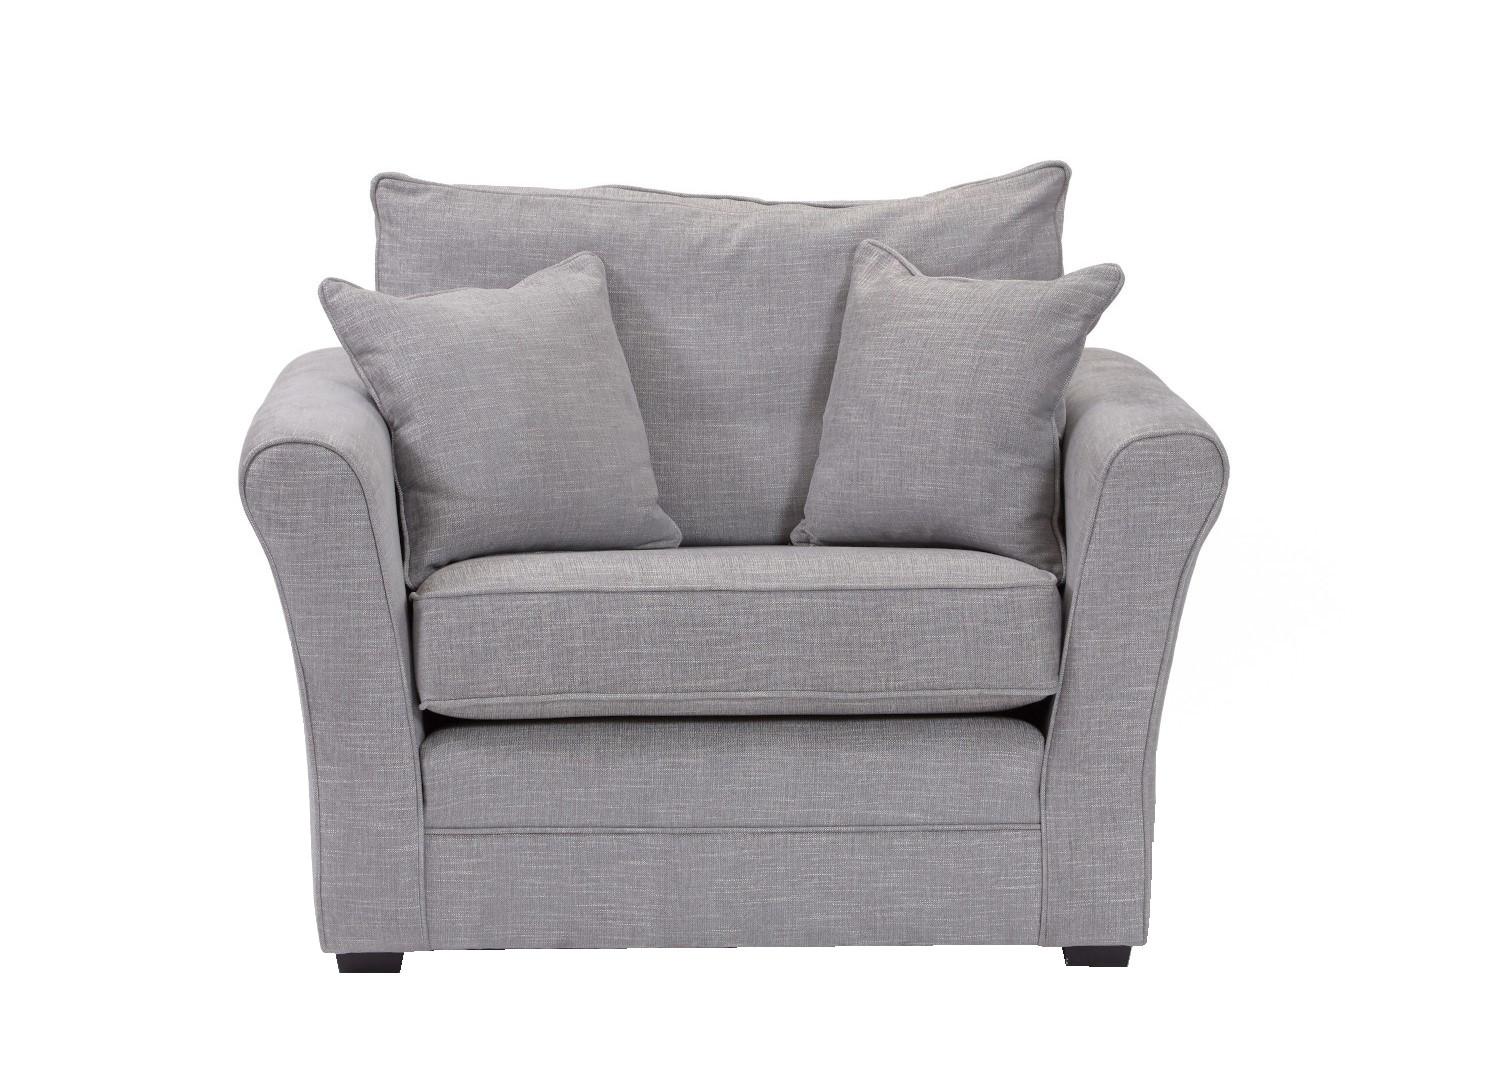 Acton Snuggler Sofa